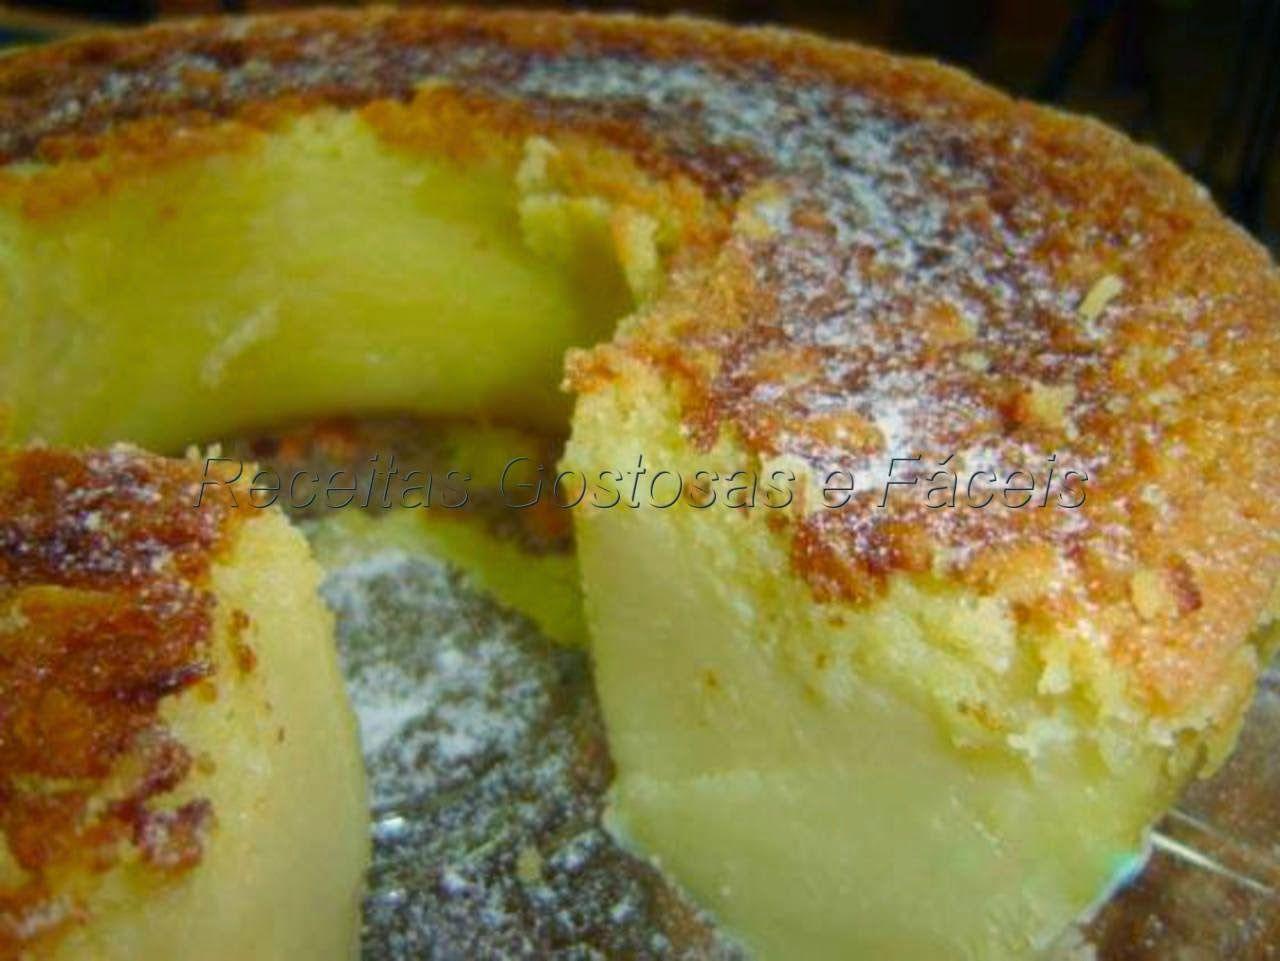 Receitas Gostosas e Fáceis .: Bolo de coco e queijo